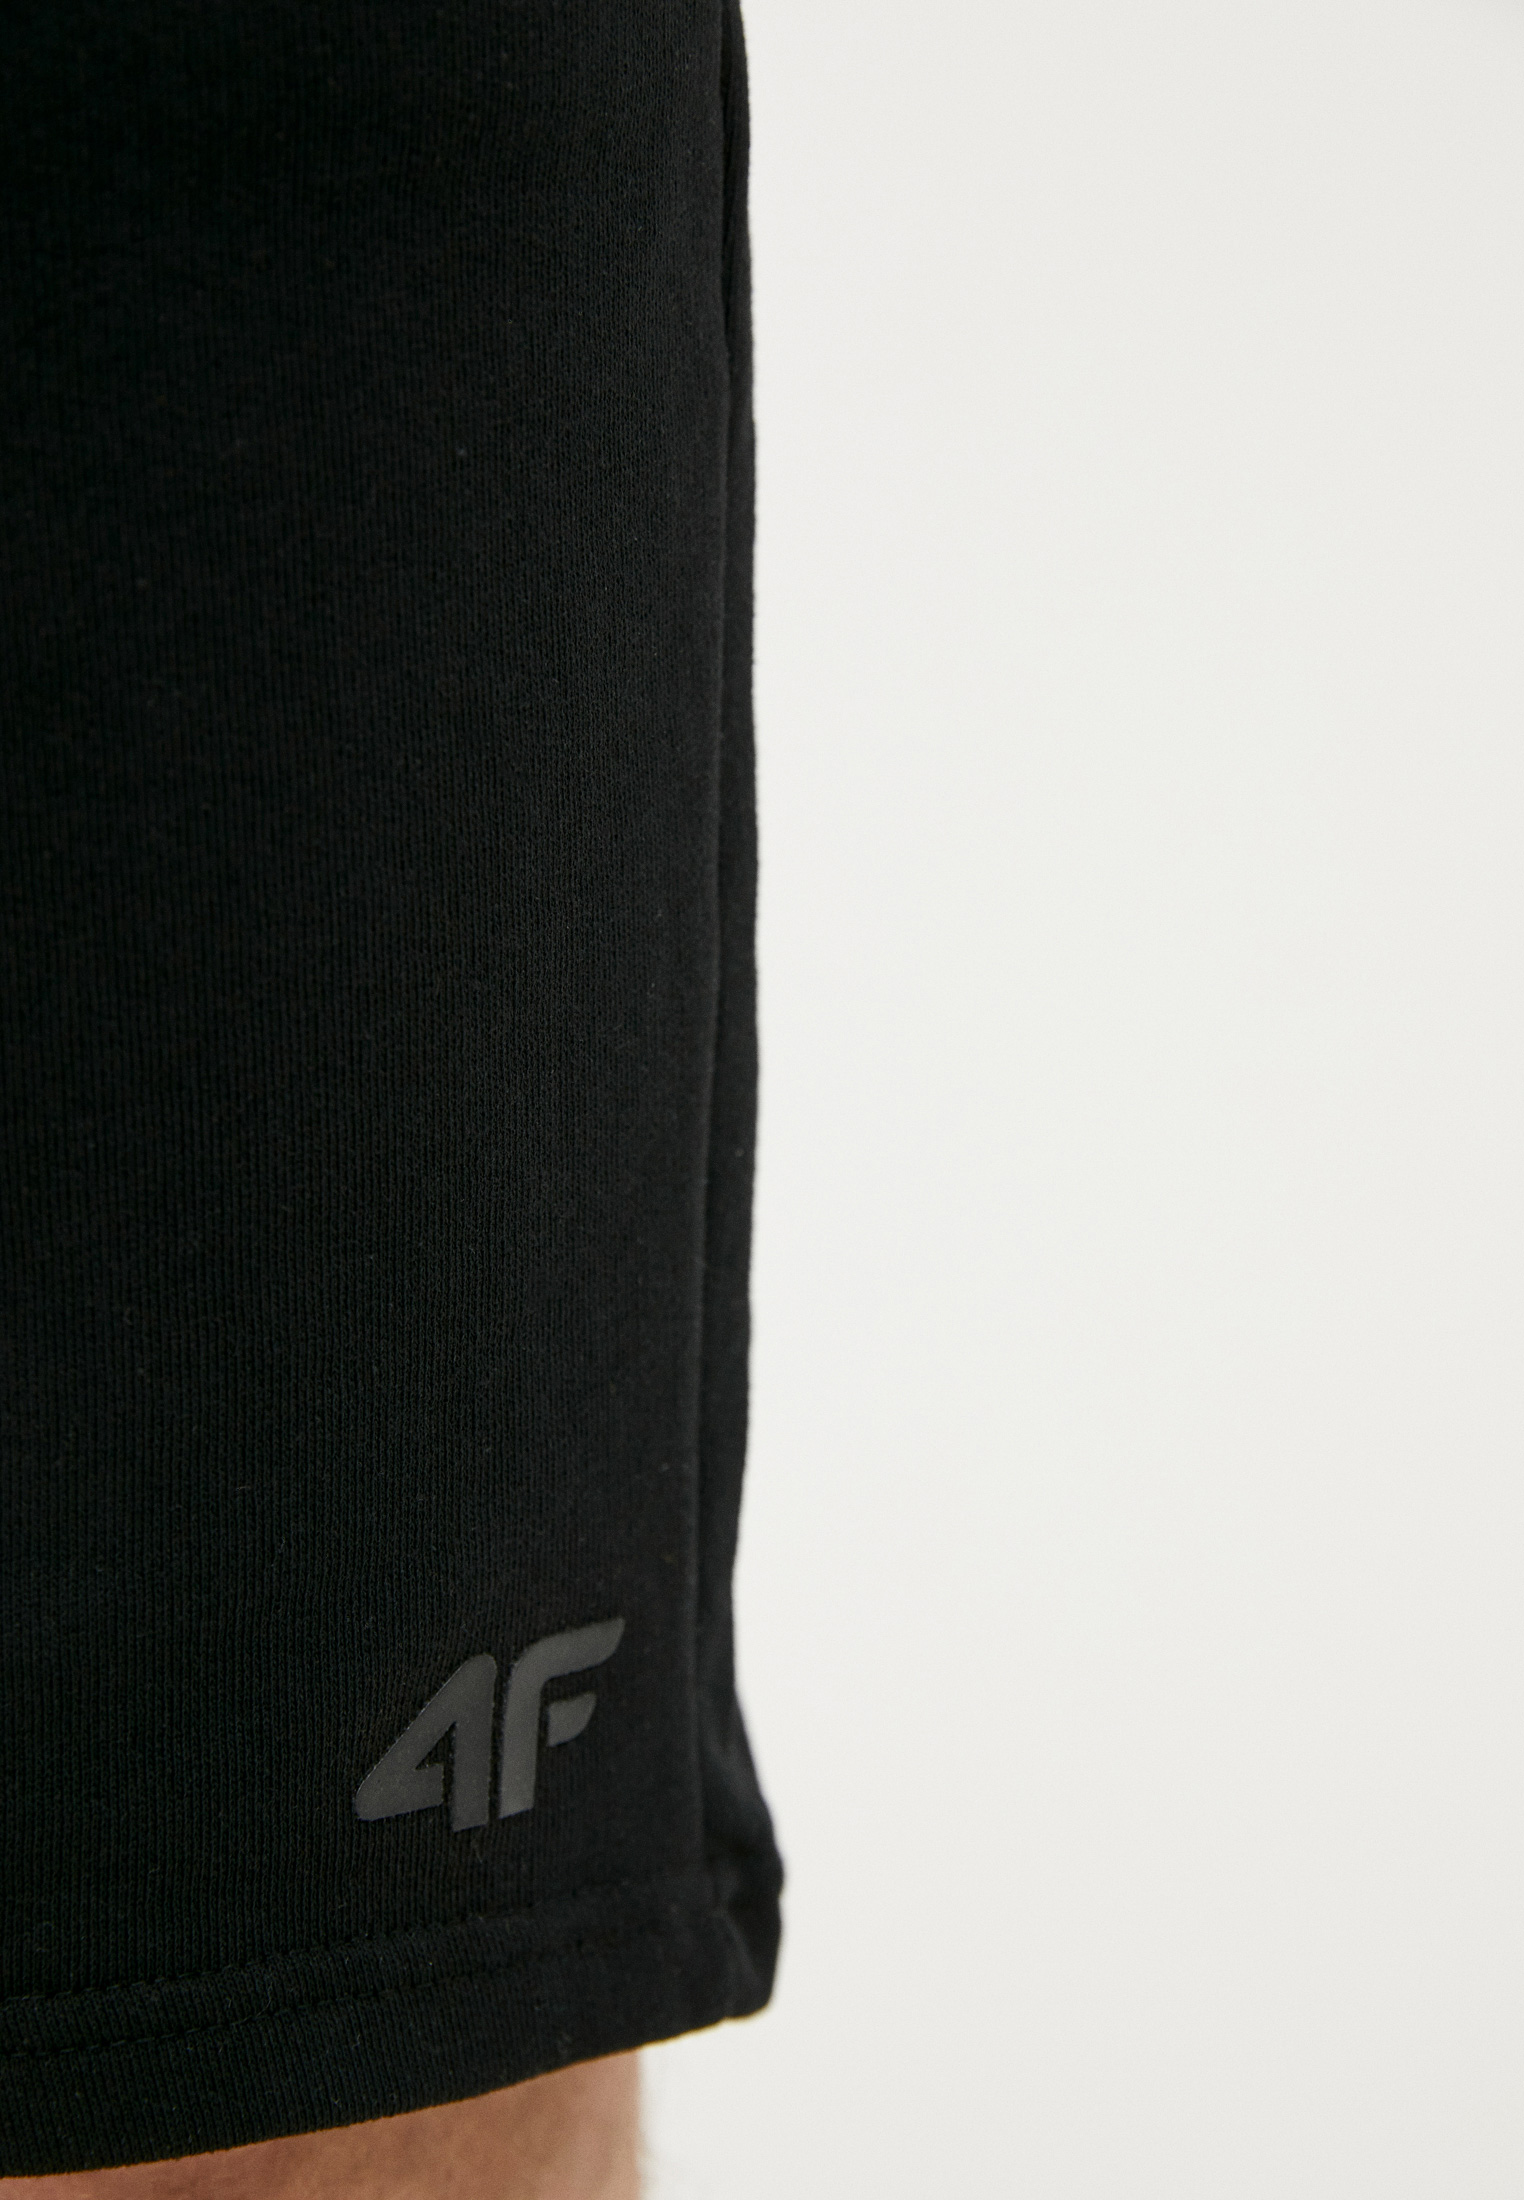 4F NOSH4-SKMD001: изображение 4